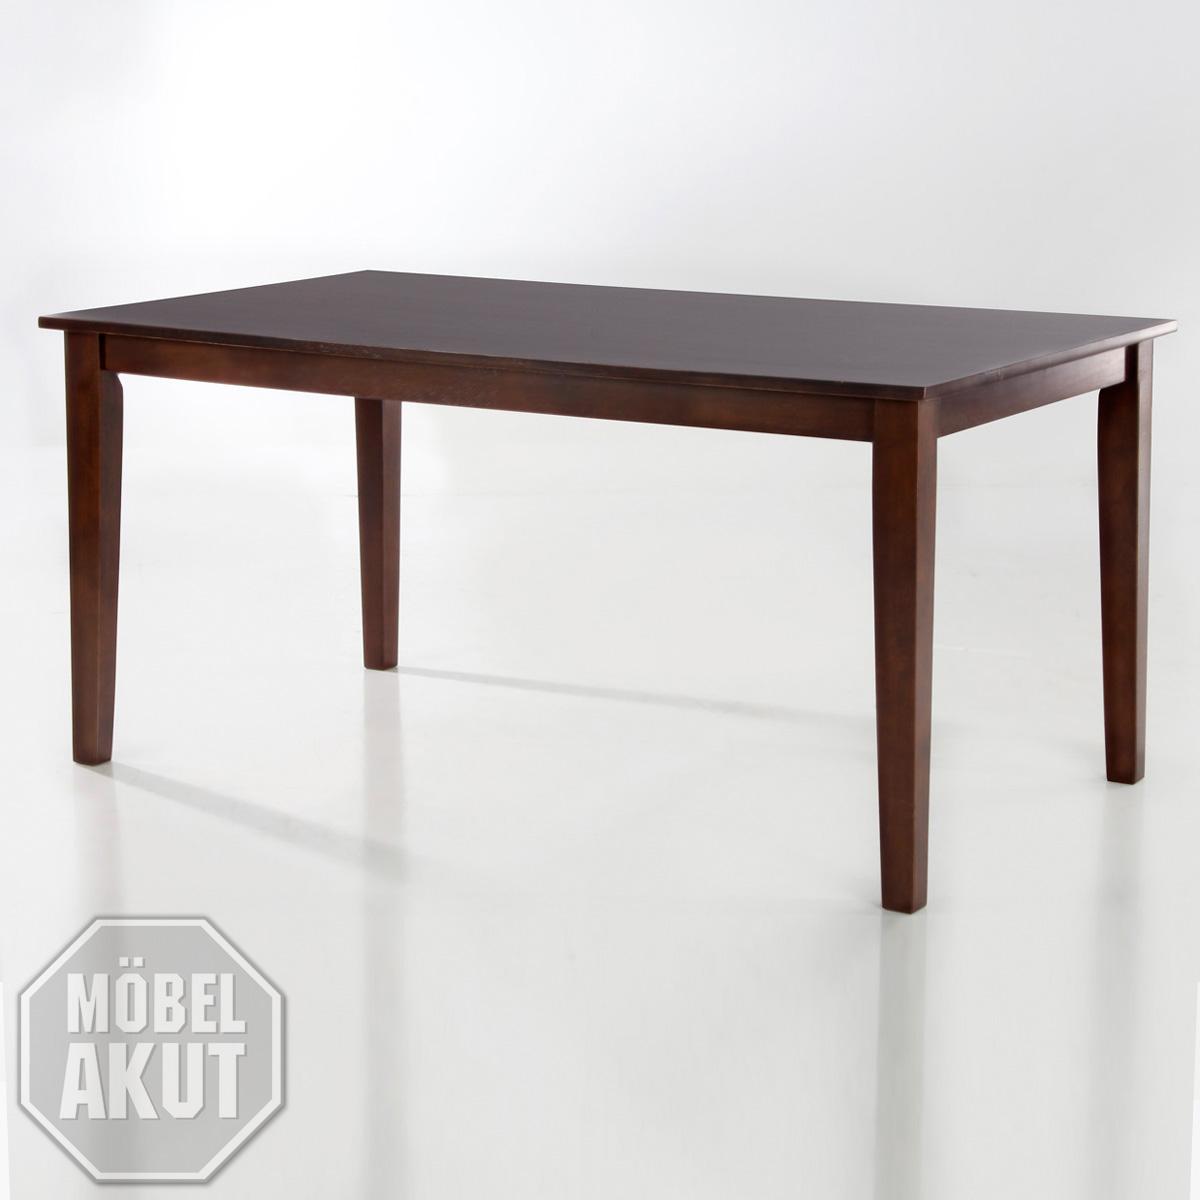 esstisch delano tisch in wenge kolonial massiv 160 x 90 ebay. Black Bedroom Furniture Sets. Home Design Ideas